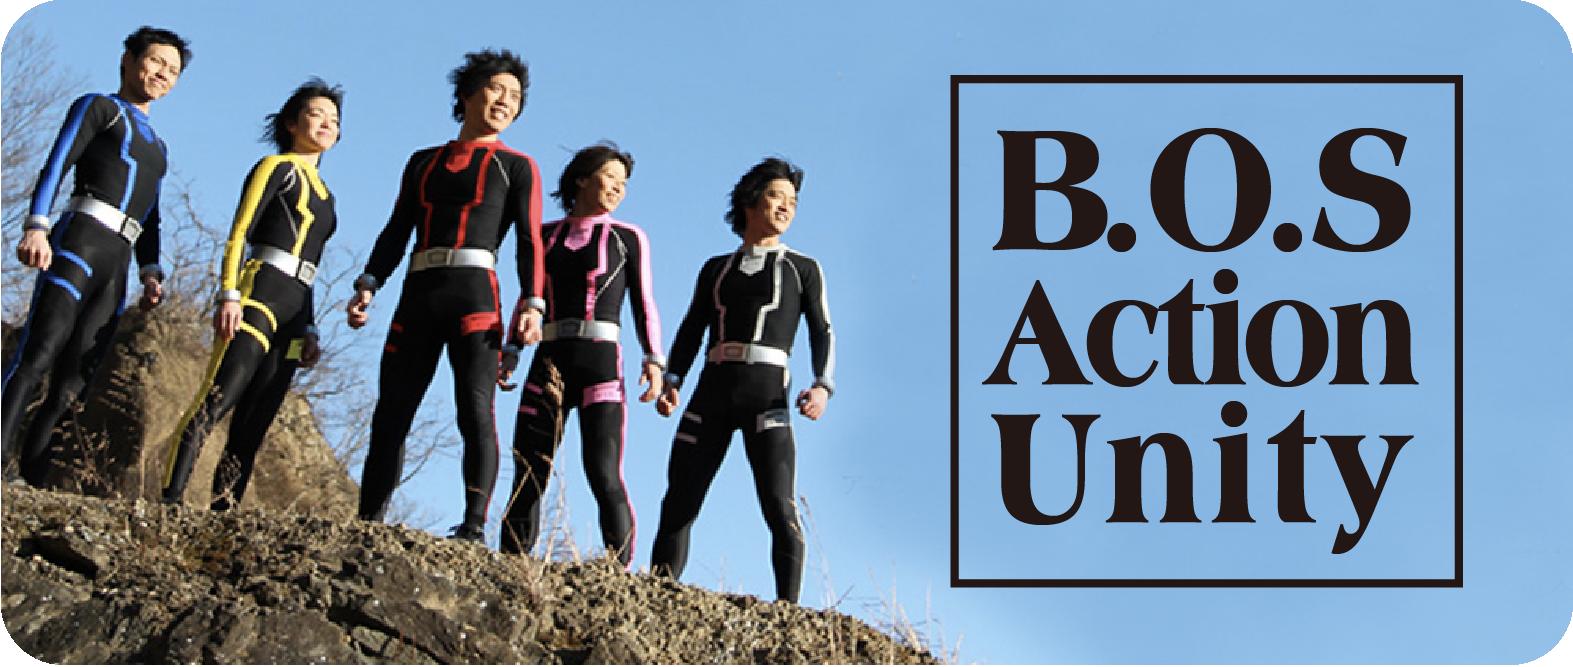 B.O.S Action Unity